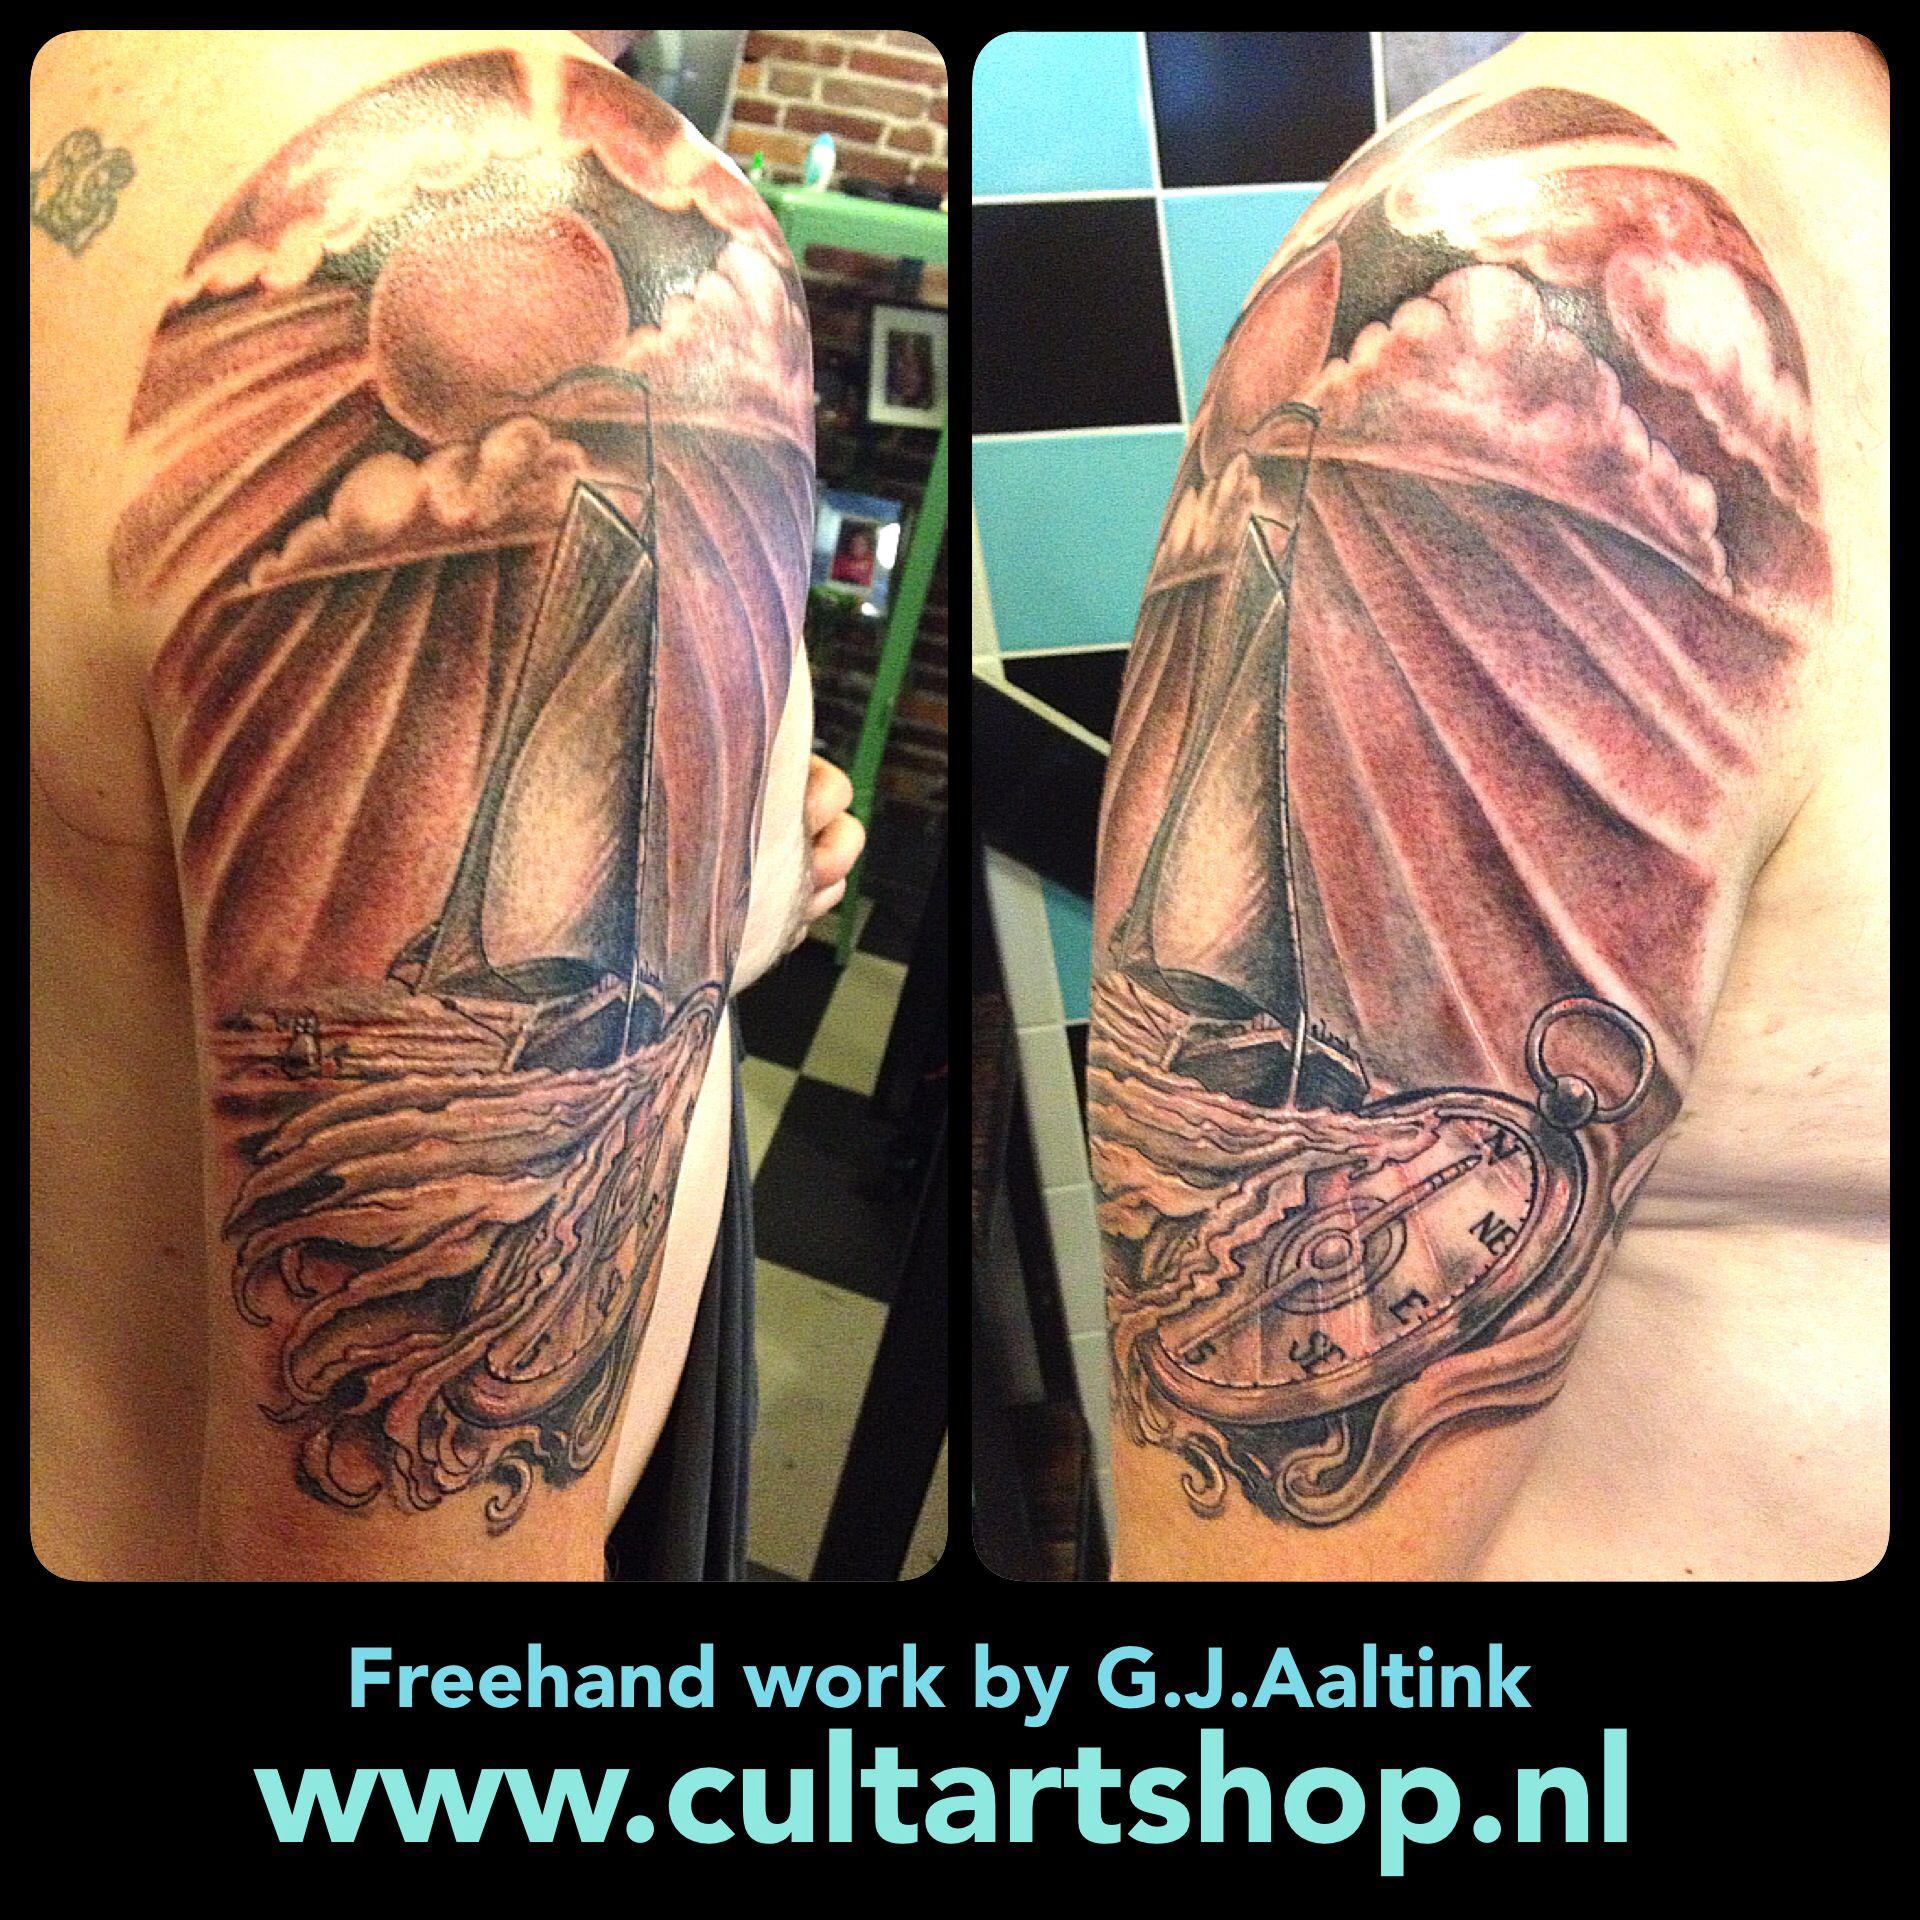 Black and Grey piece ...by gjaaltink #tattoo #ship #cult #art